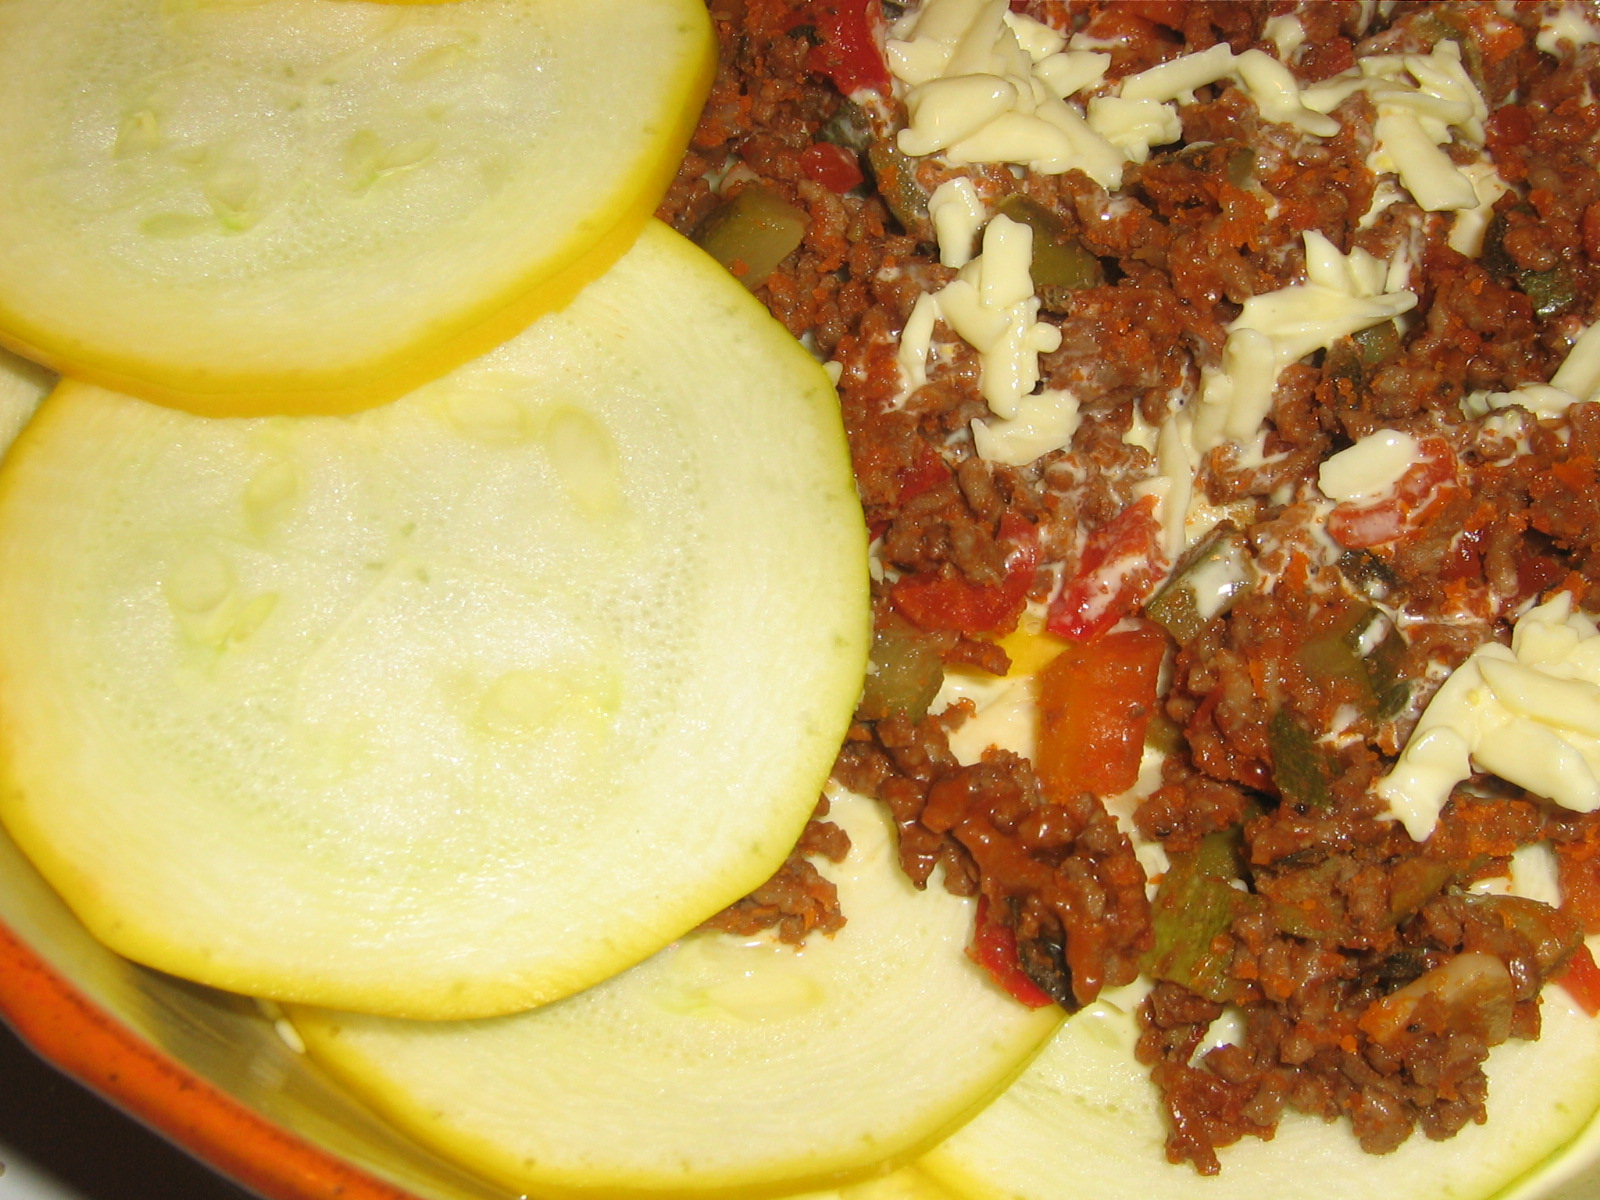 Gul Zucchini, Köttfärssås och Ostsås blir Lowcarb Lasagne